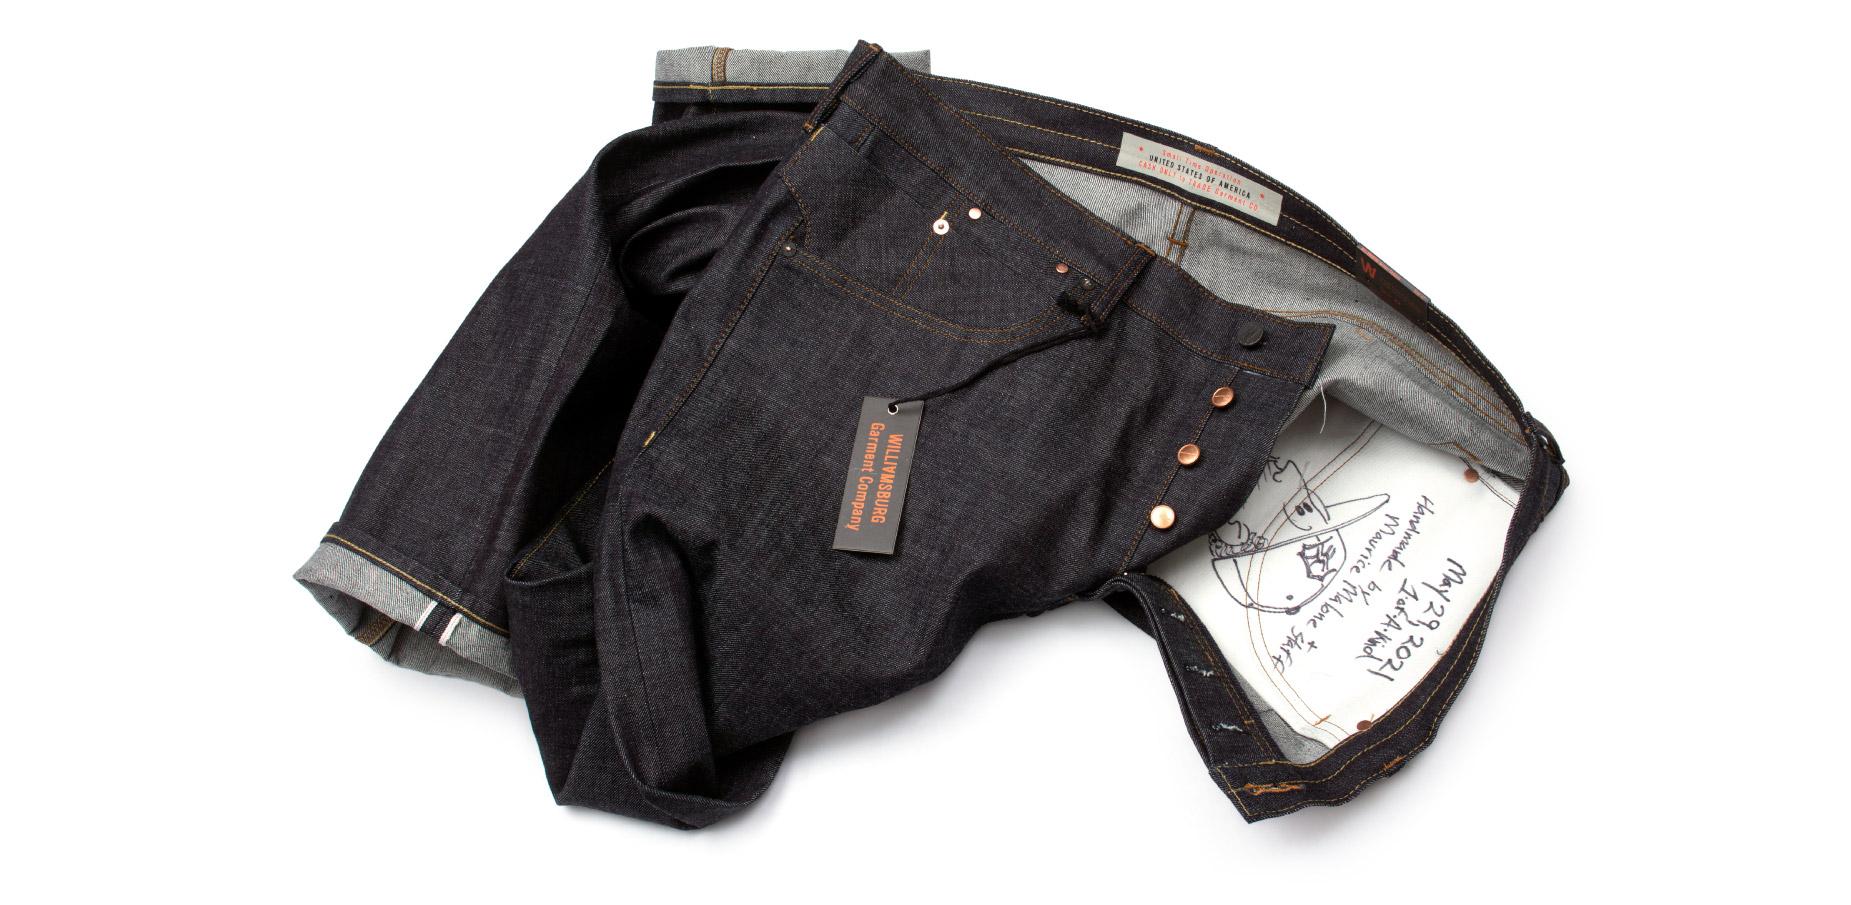 Handmade size 44 Japanese selvedge raw denim jeans made in Brooklyn